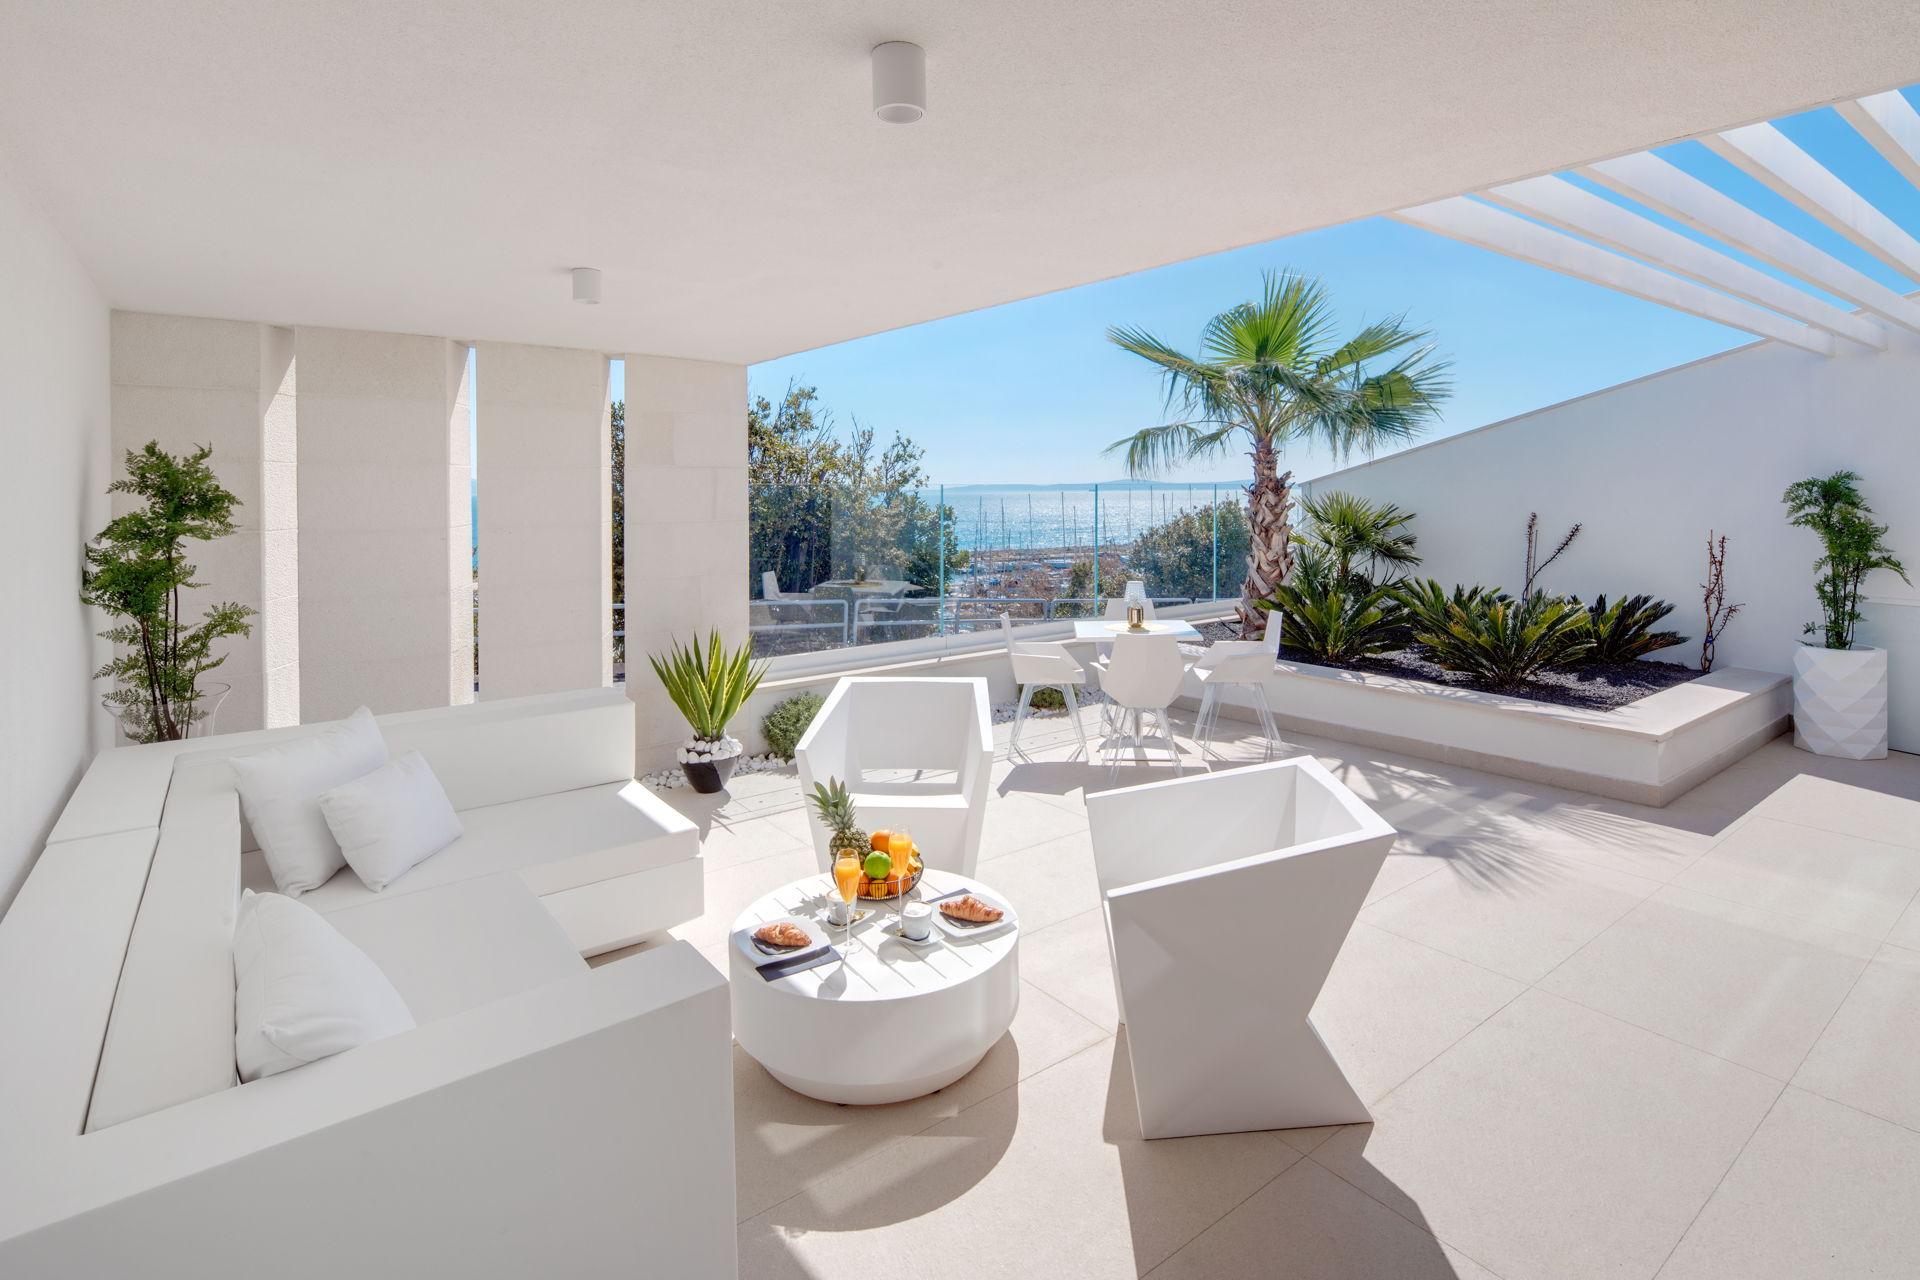 Breakfast with a view Posh Residence Split